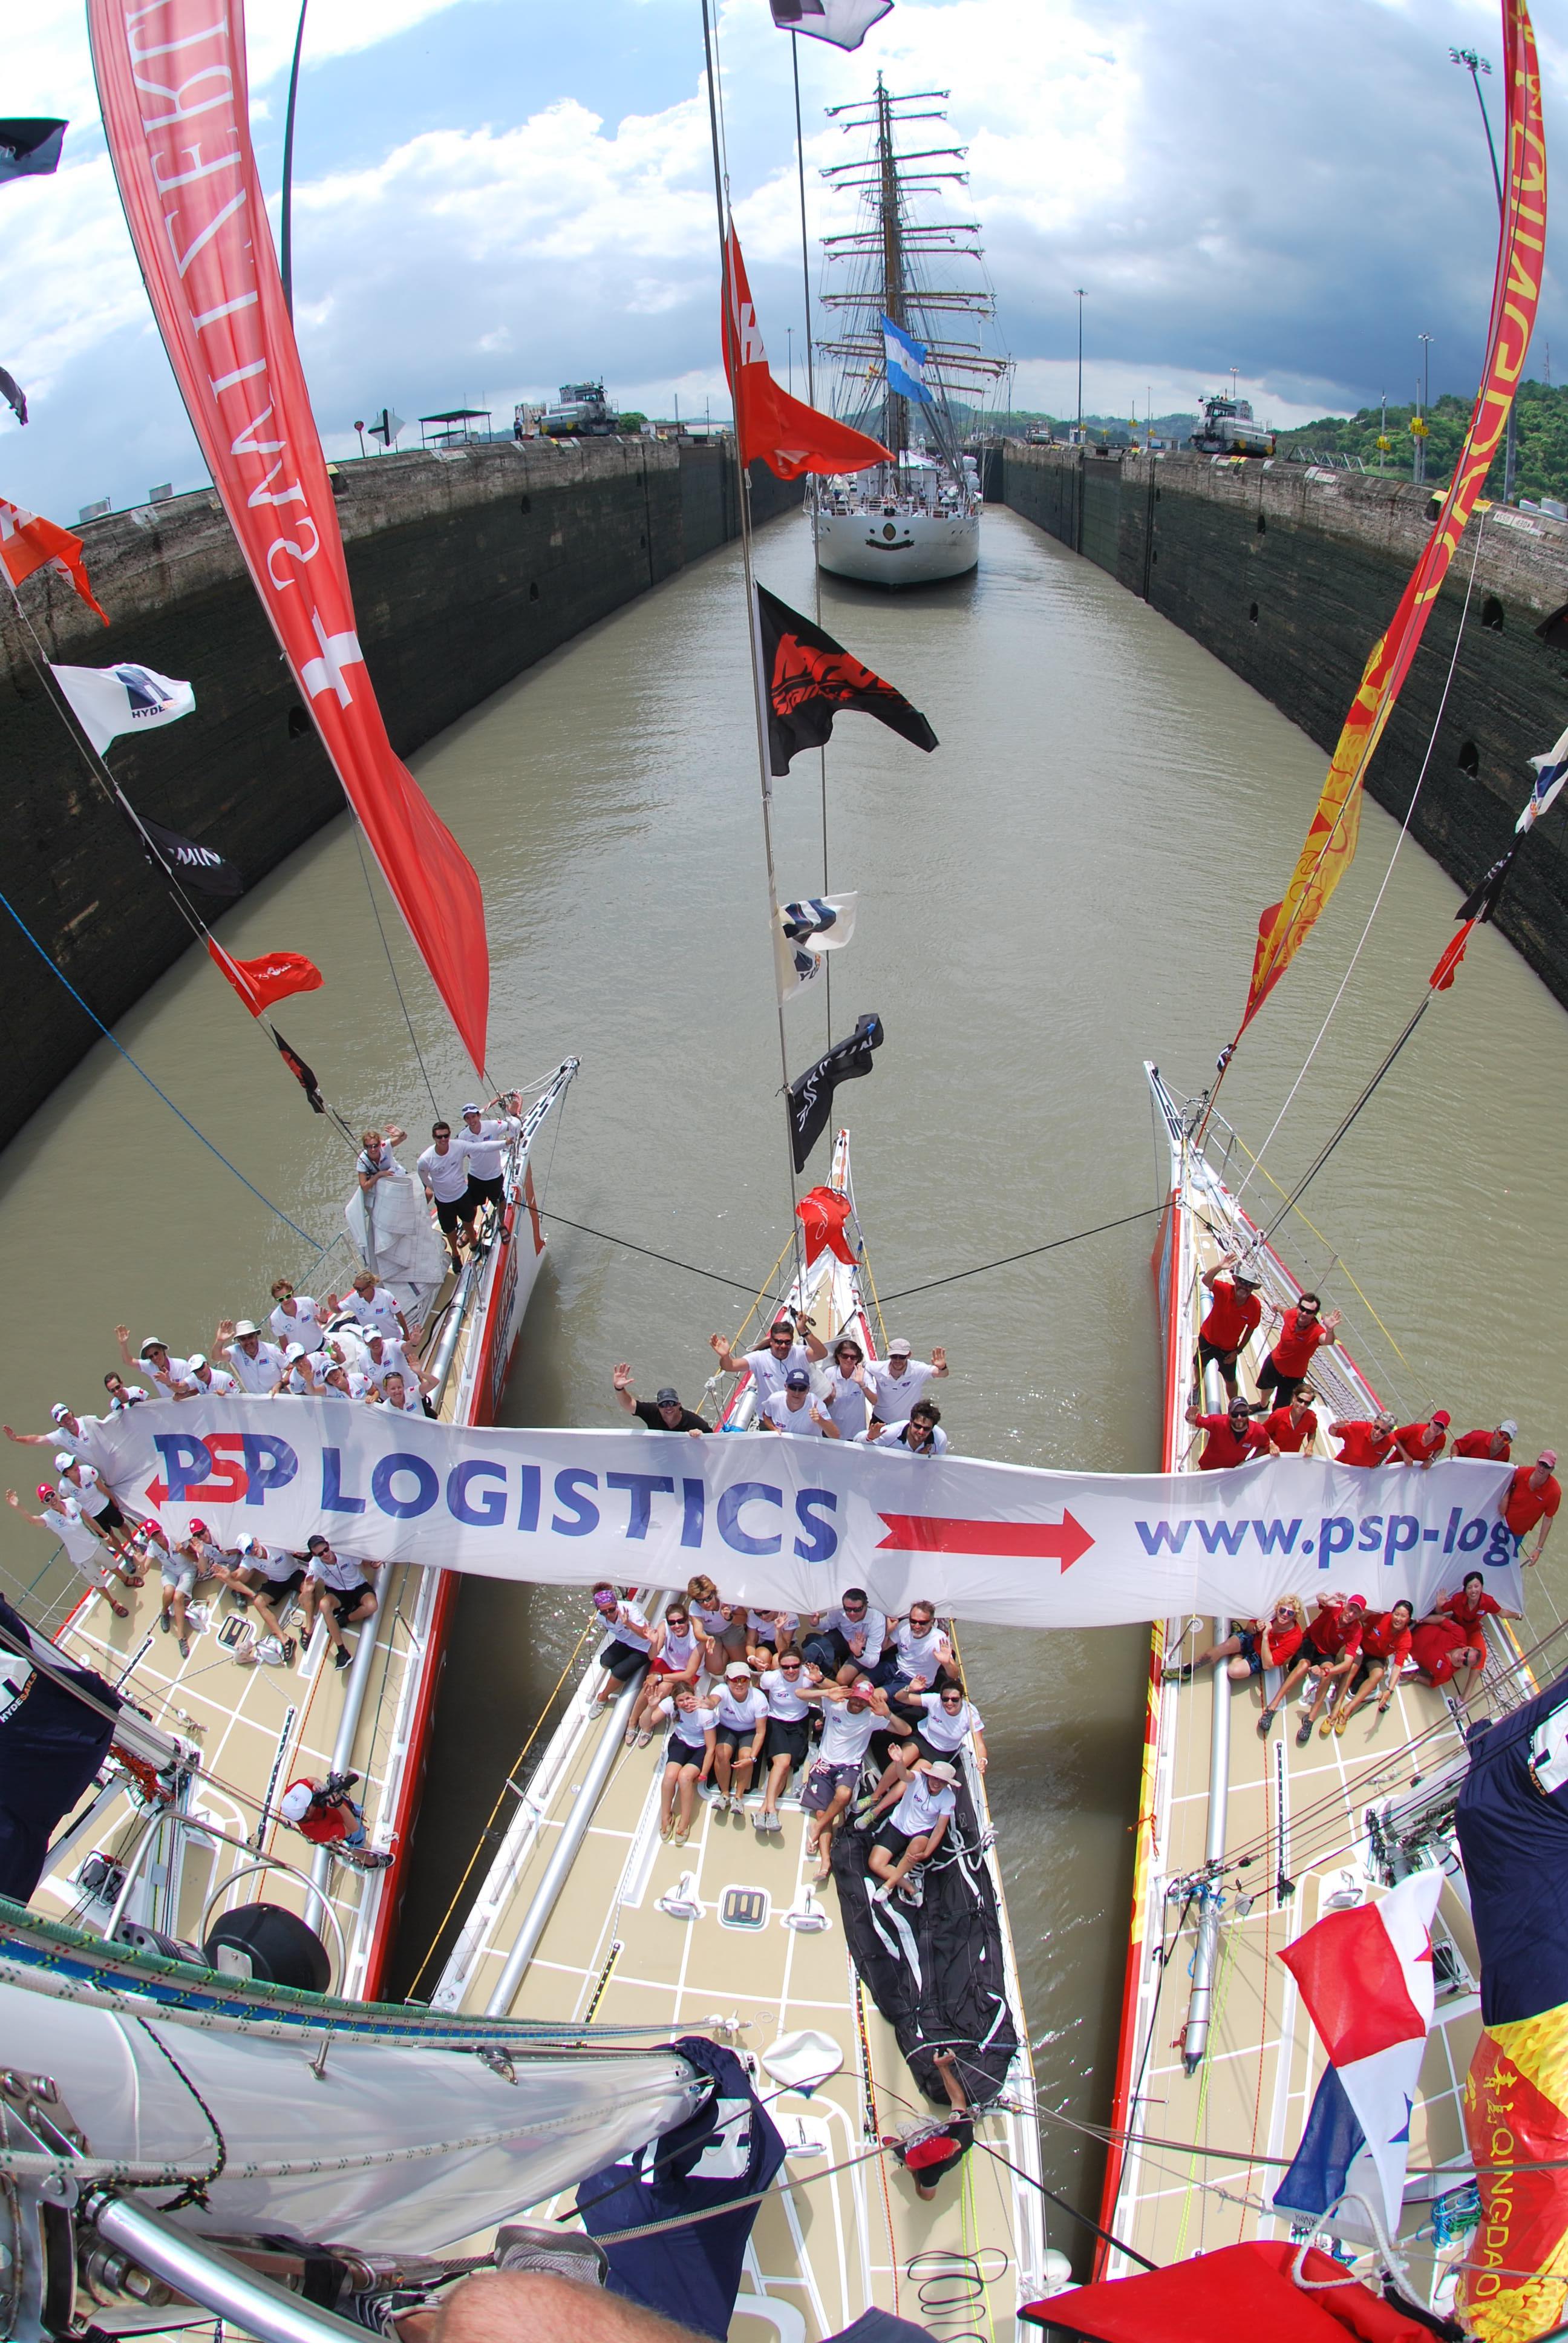 British Logistics Company Flying Flag Through Panama Canal